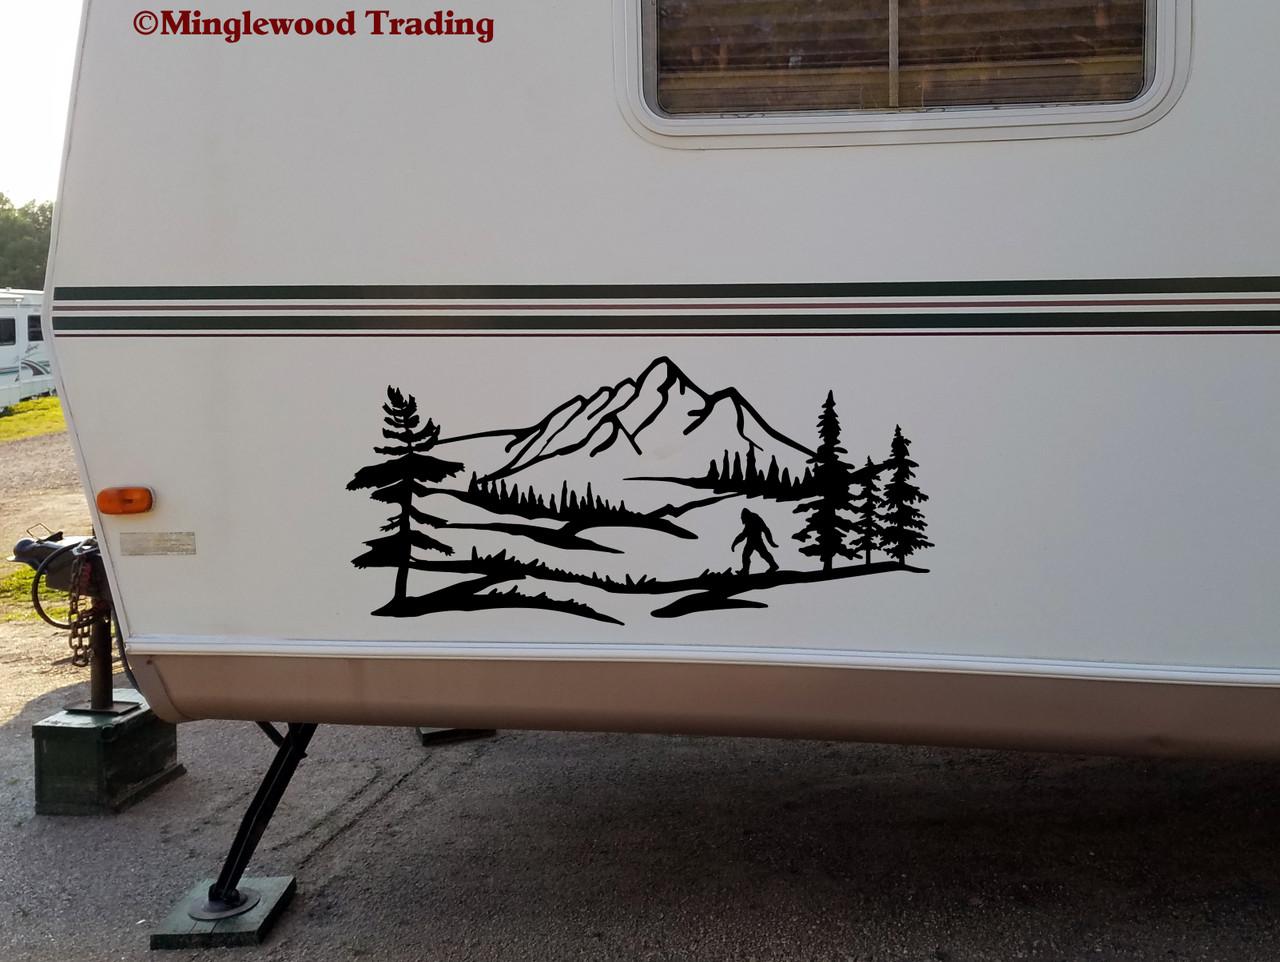 Bigfoot Mountain Trees Scene V2 Vinyl Sticker - Camper RV Travel Trailer Graphics 4x4 - Die Cut Decal